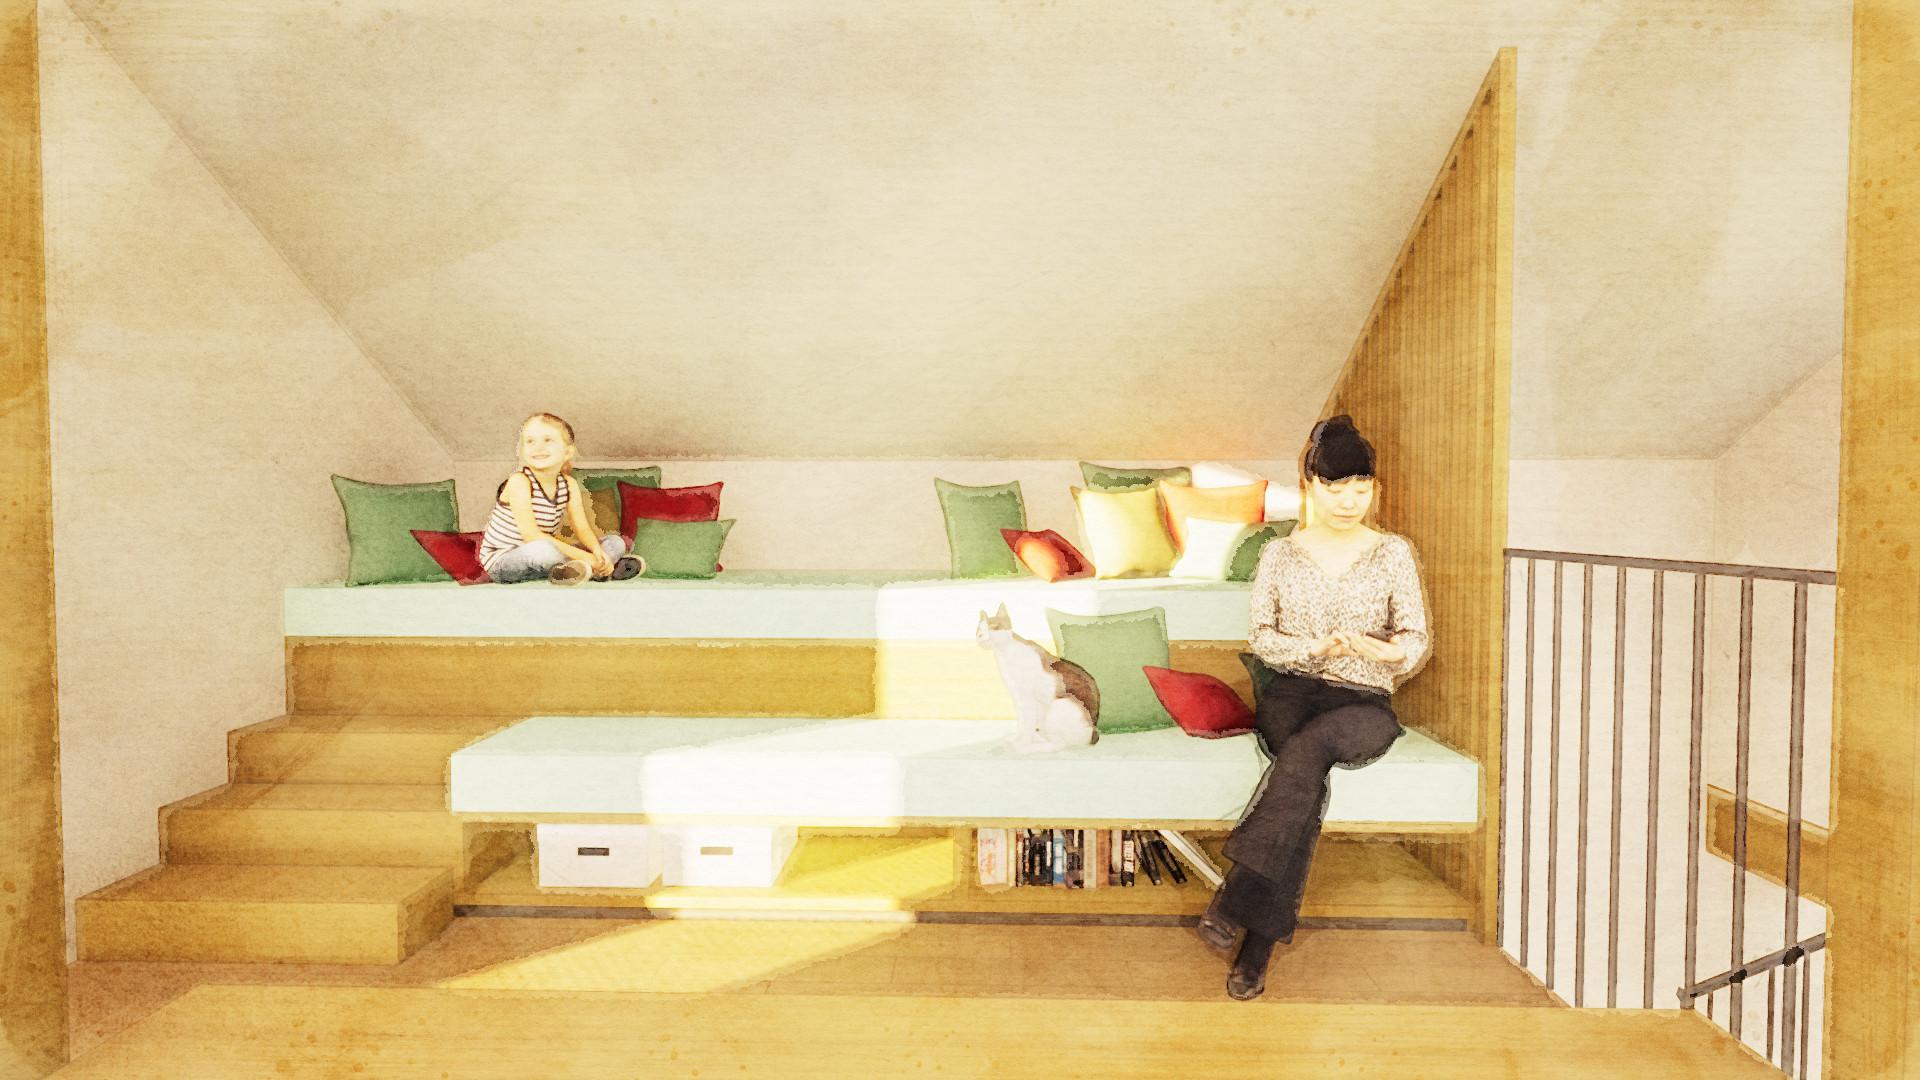 Hirundo-Architecture_Projet B&R_07.jpg